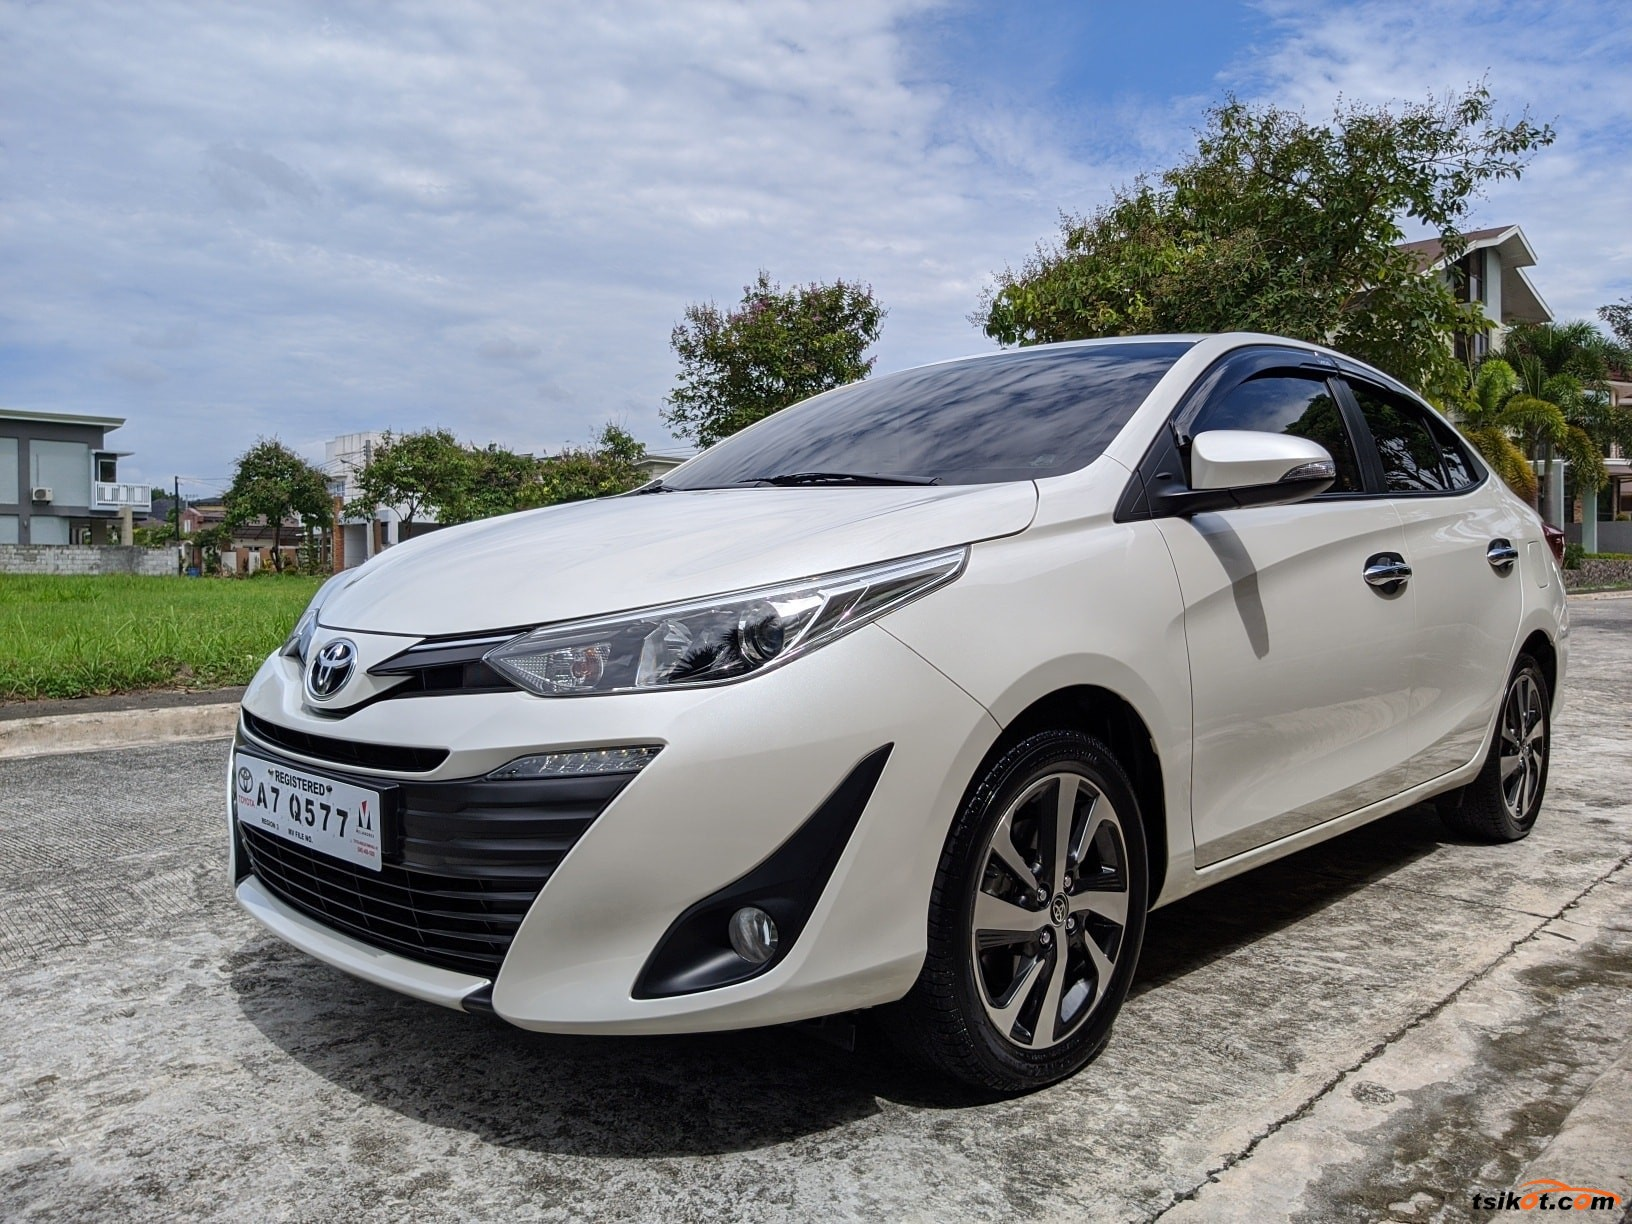 Toyota Vios 2018 - 1